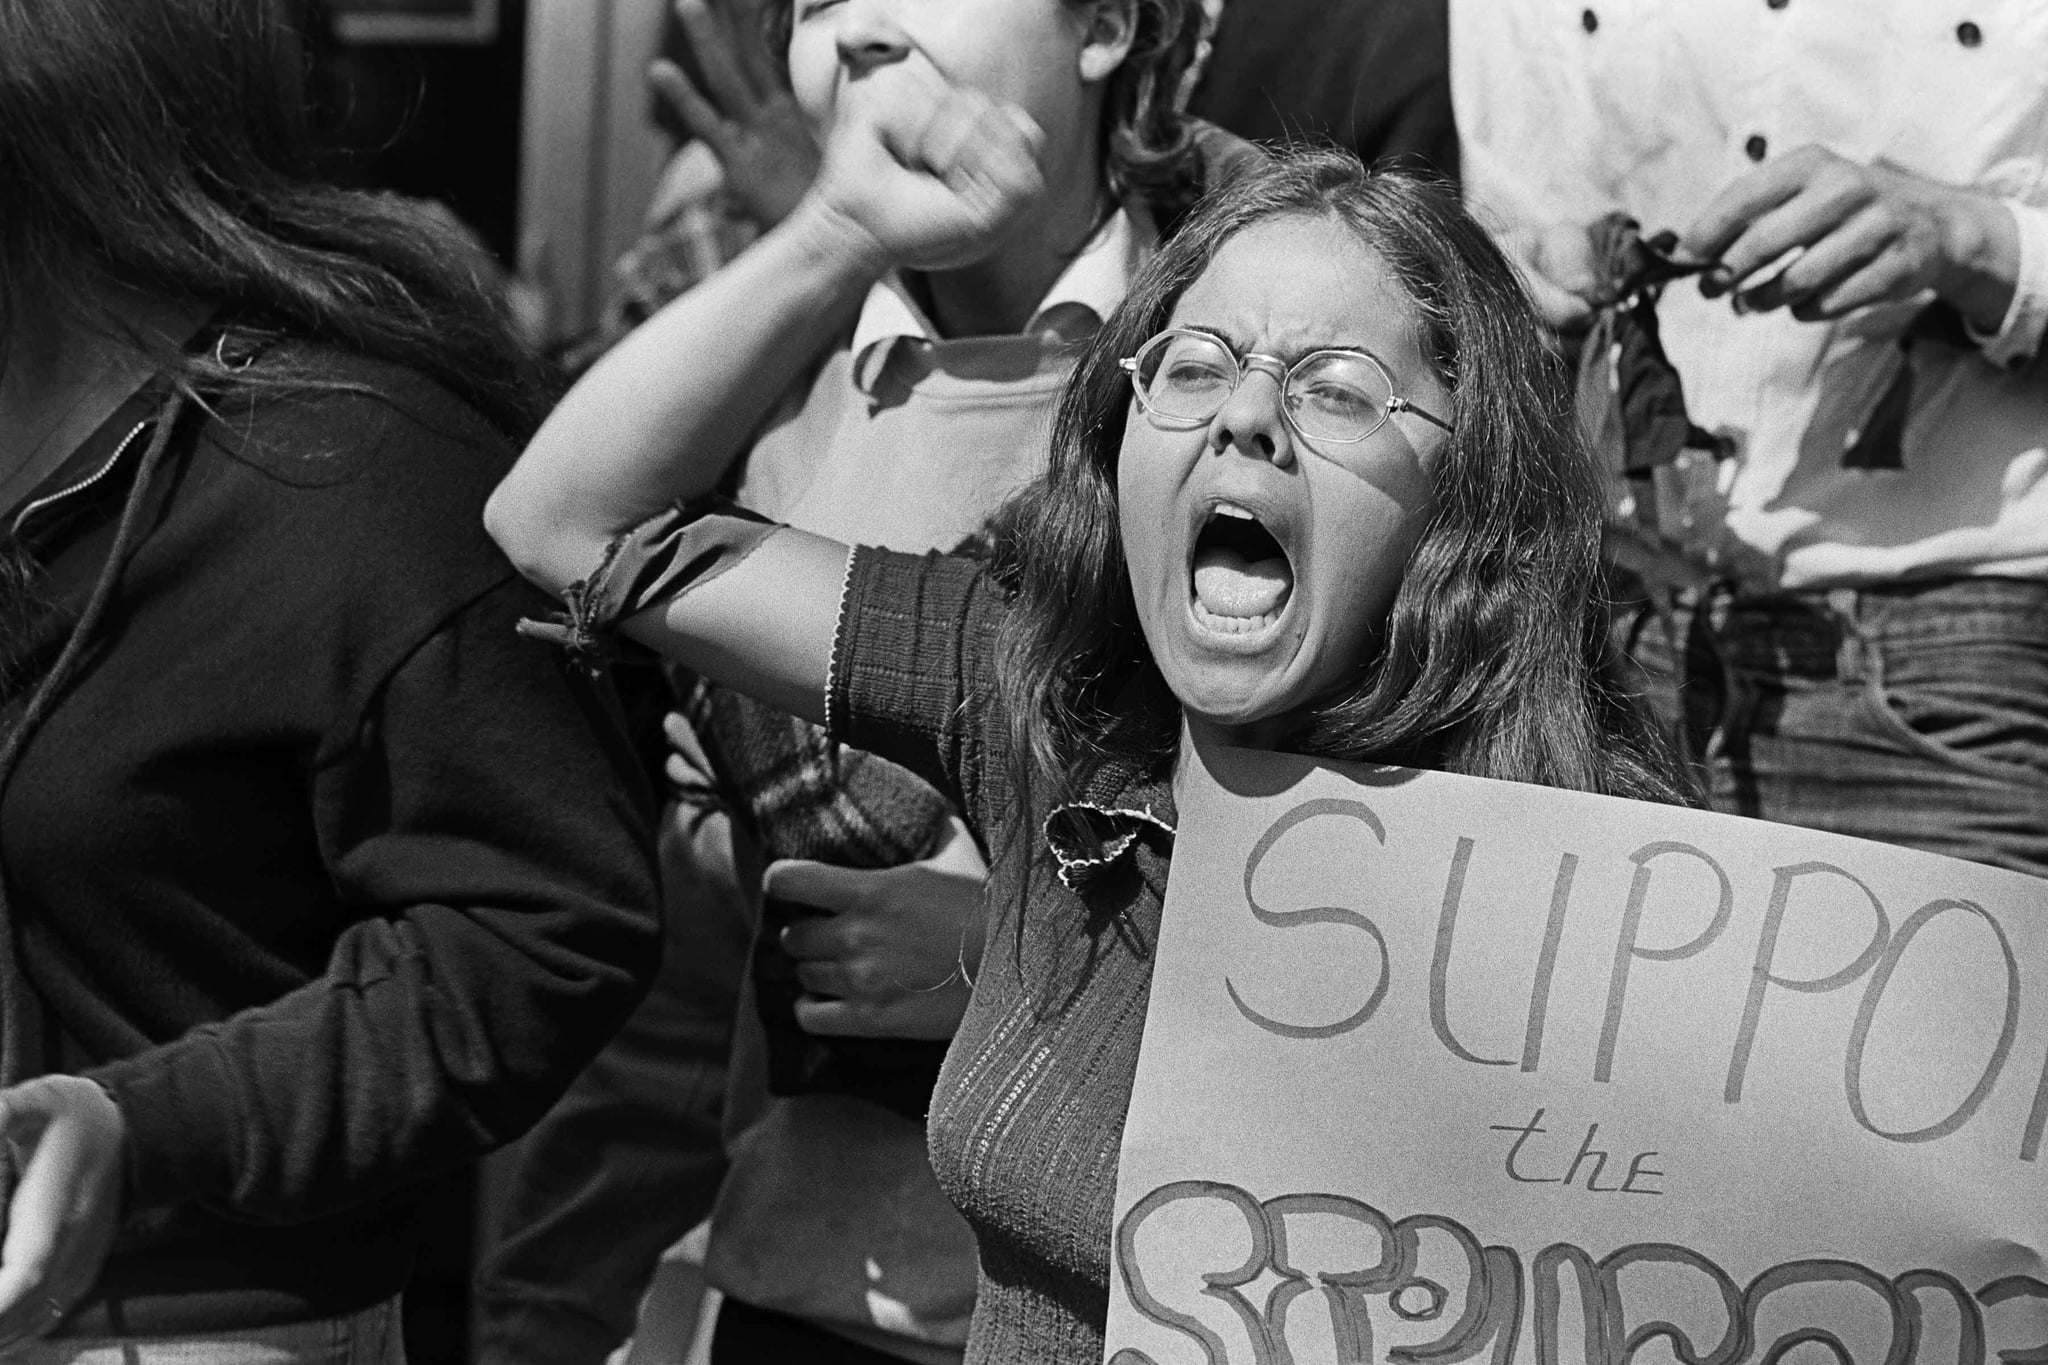 Chicano Movement in US, 1975